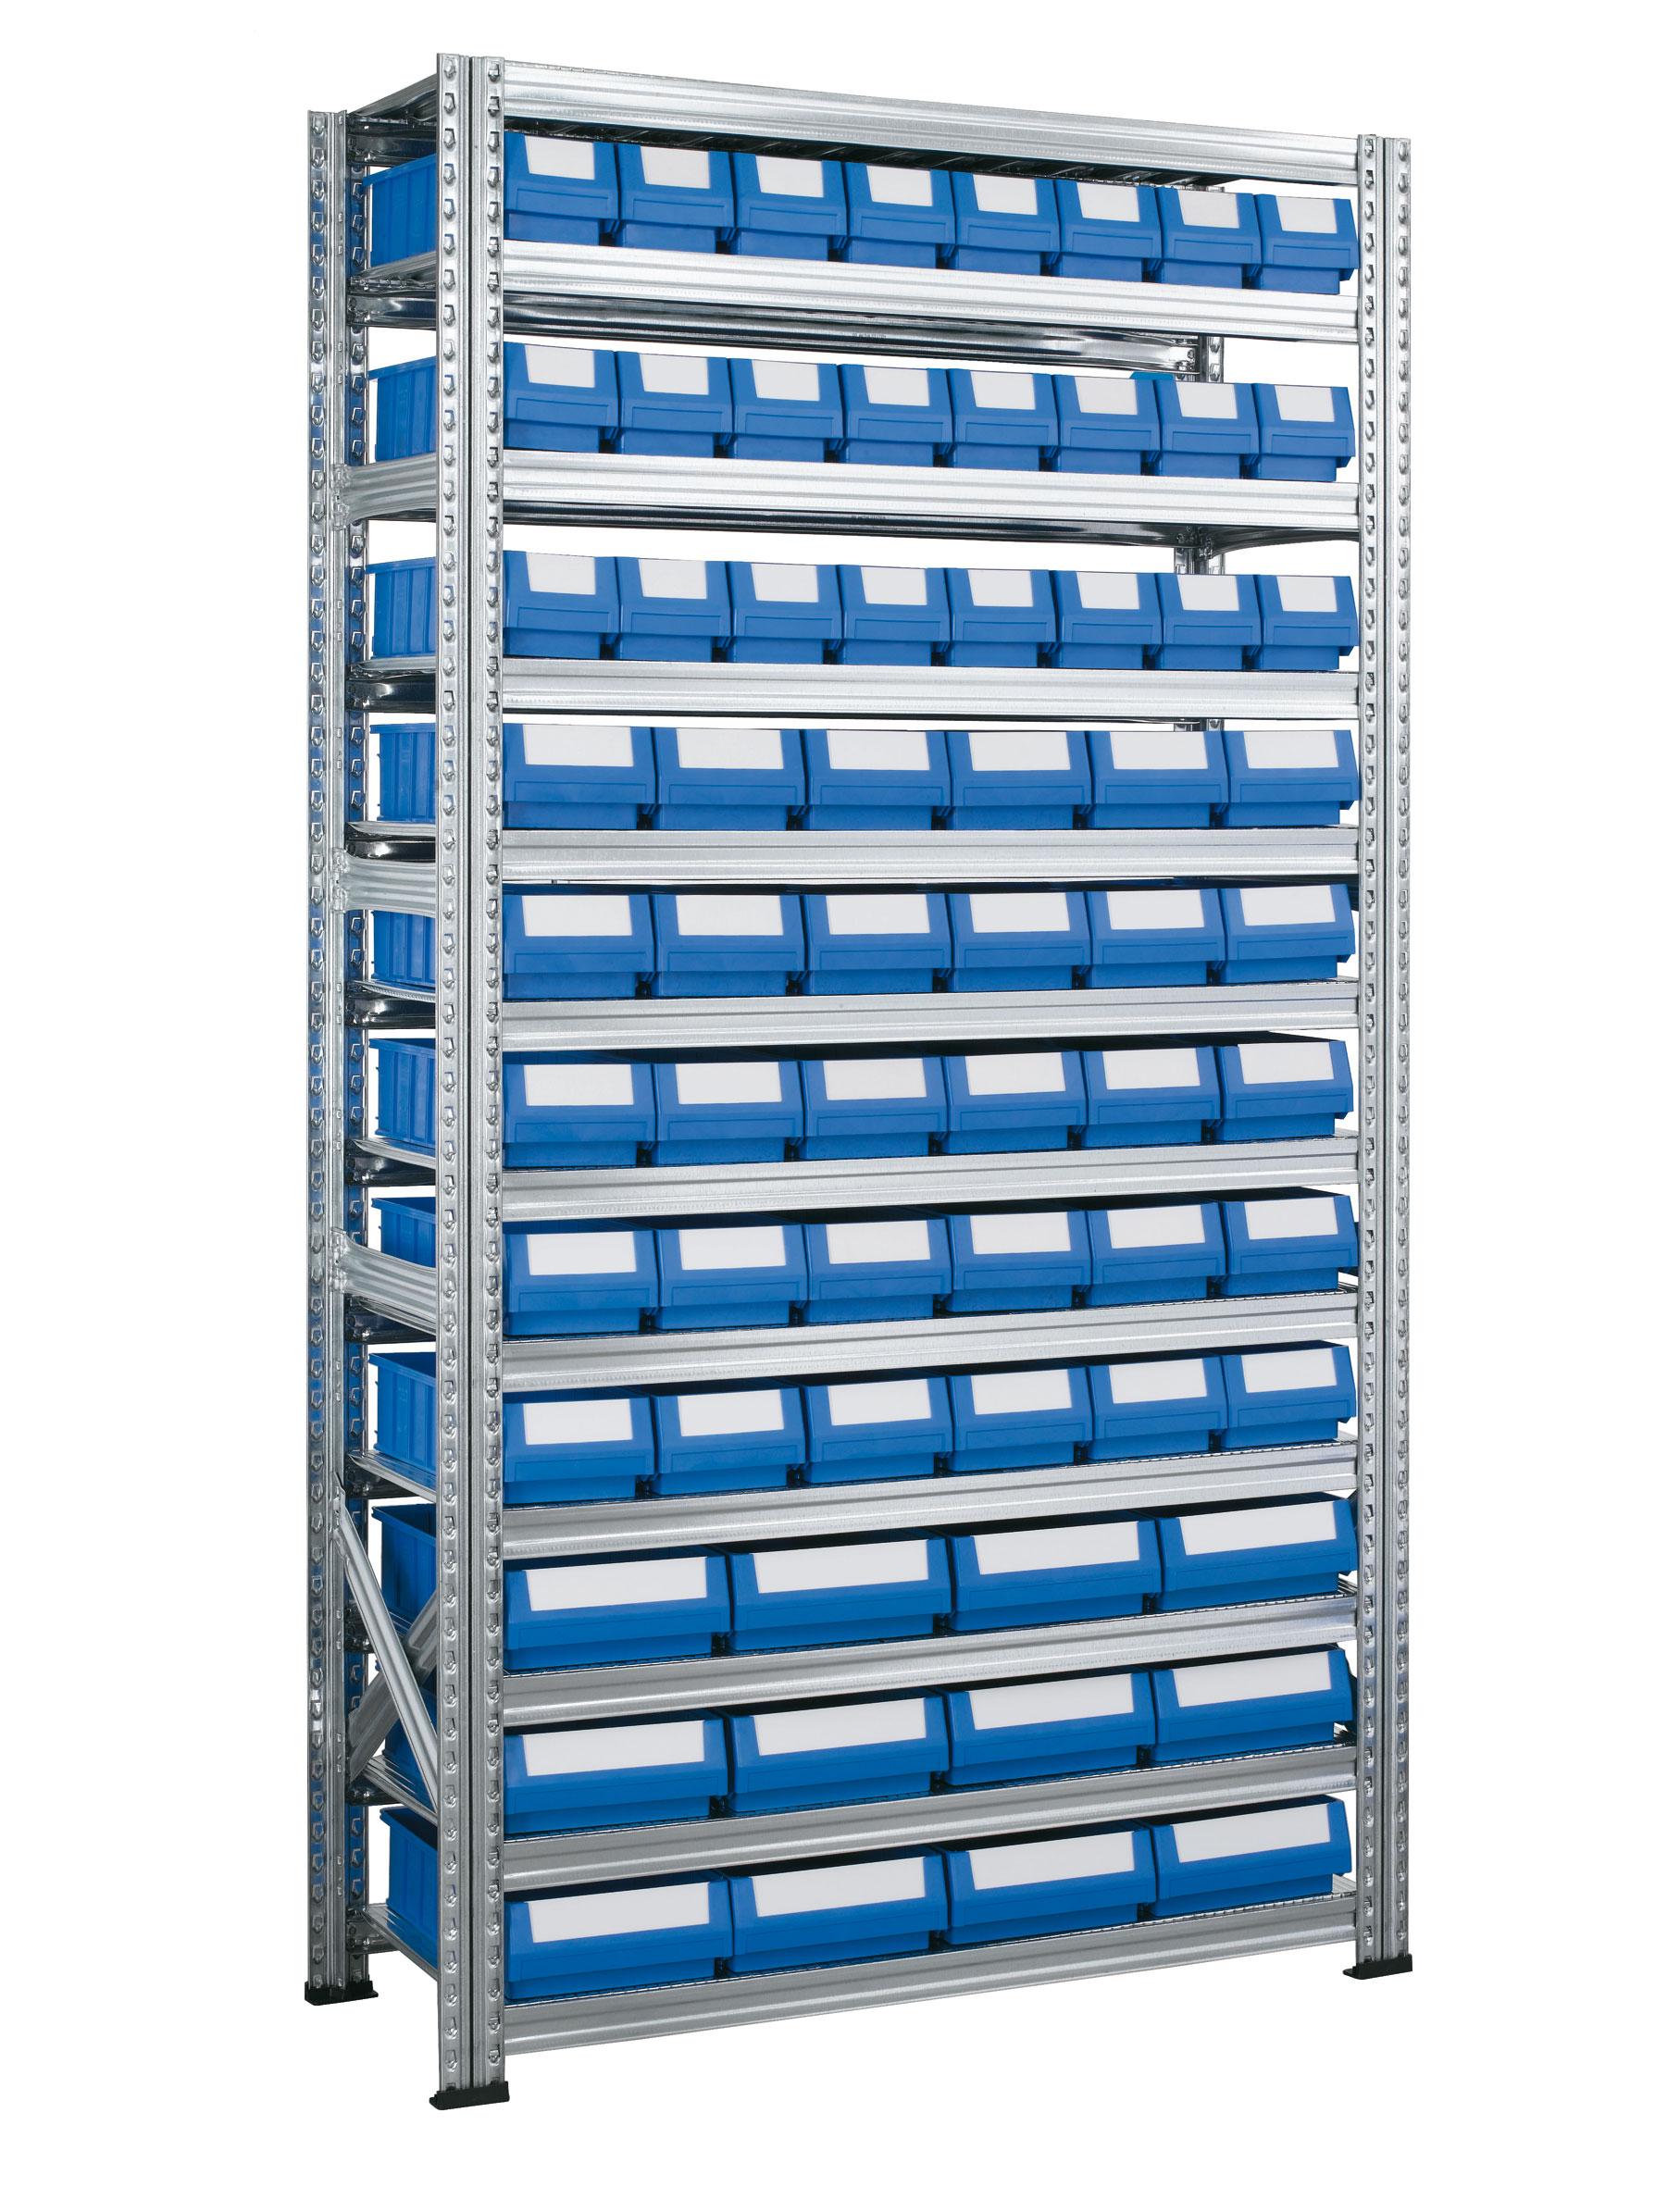 Rayonnage à tiroirs plastiques avec 66 bacs tiroirs